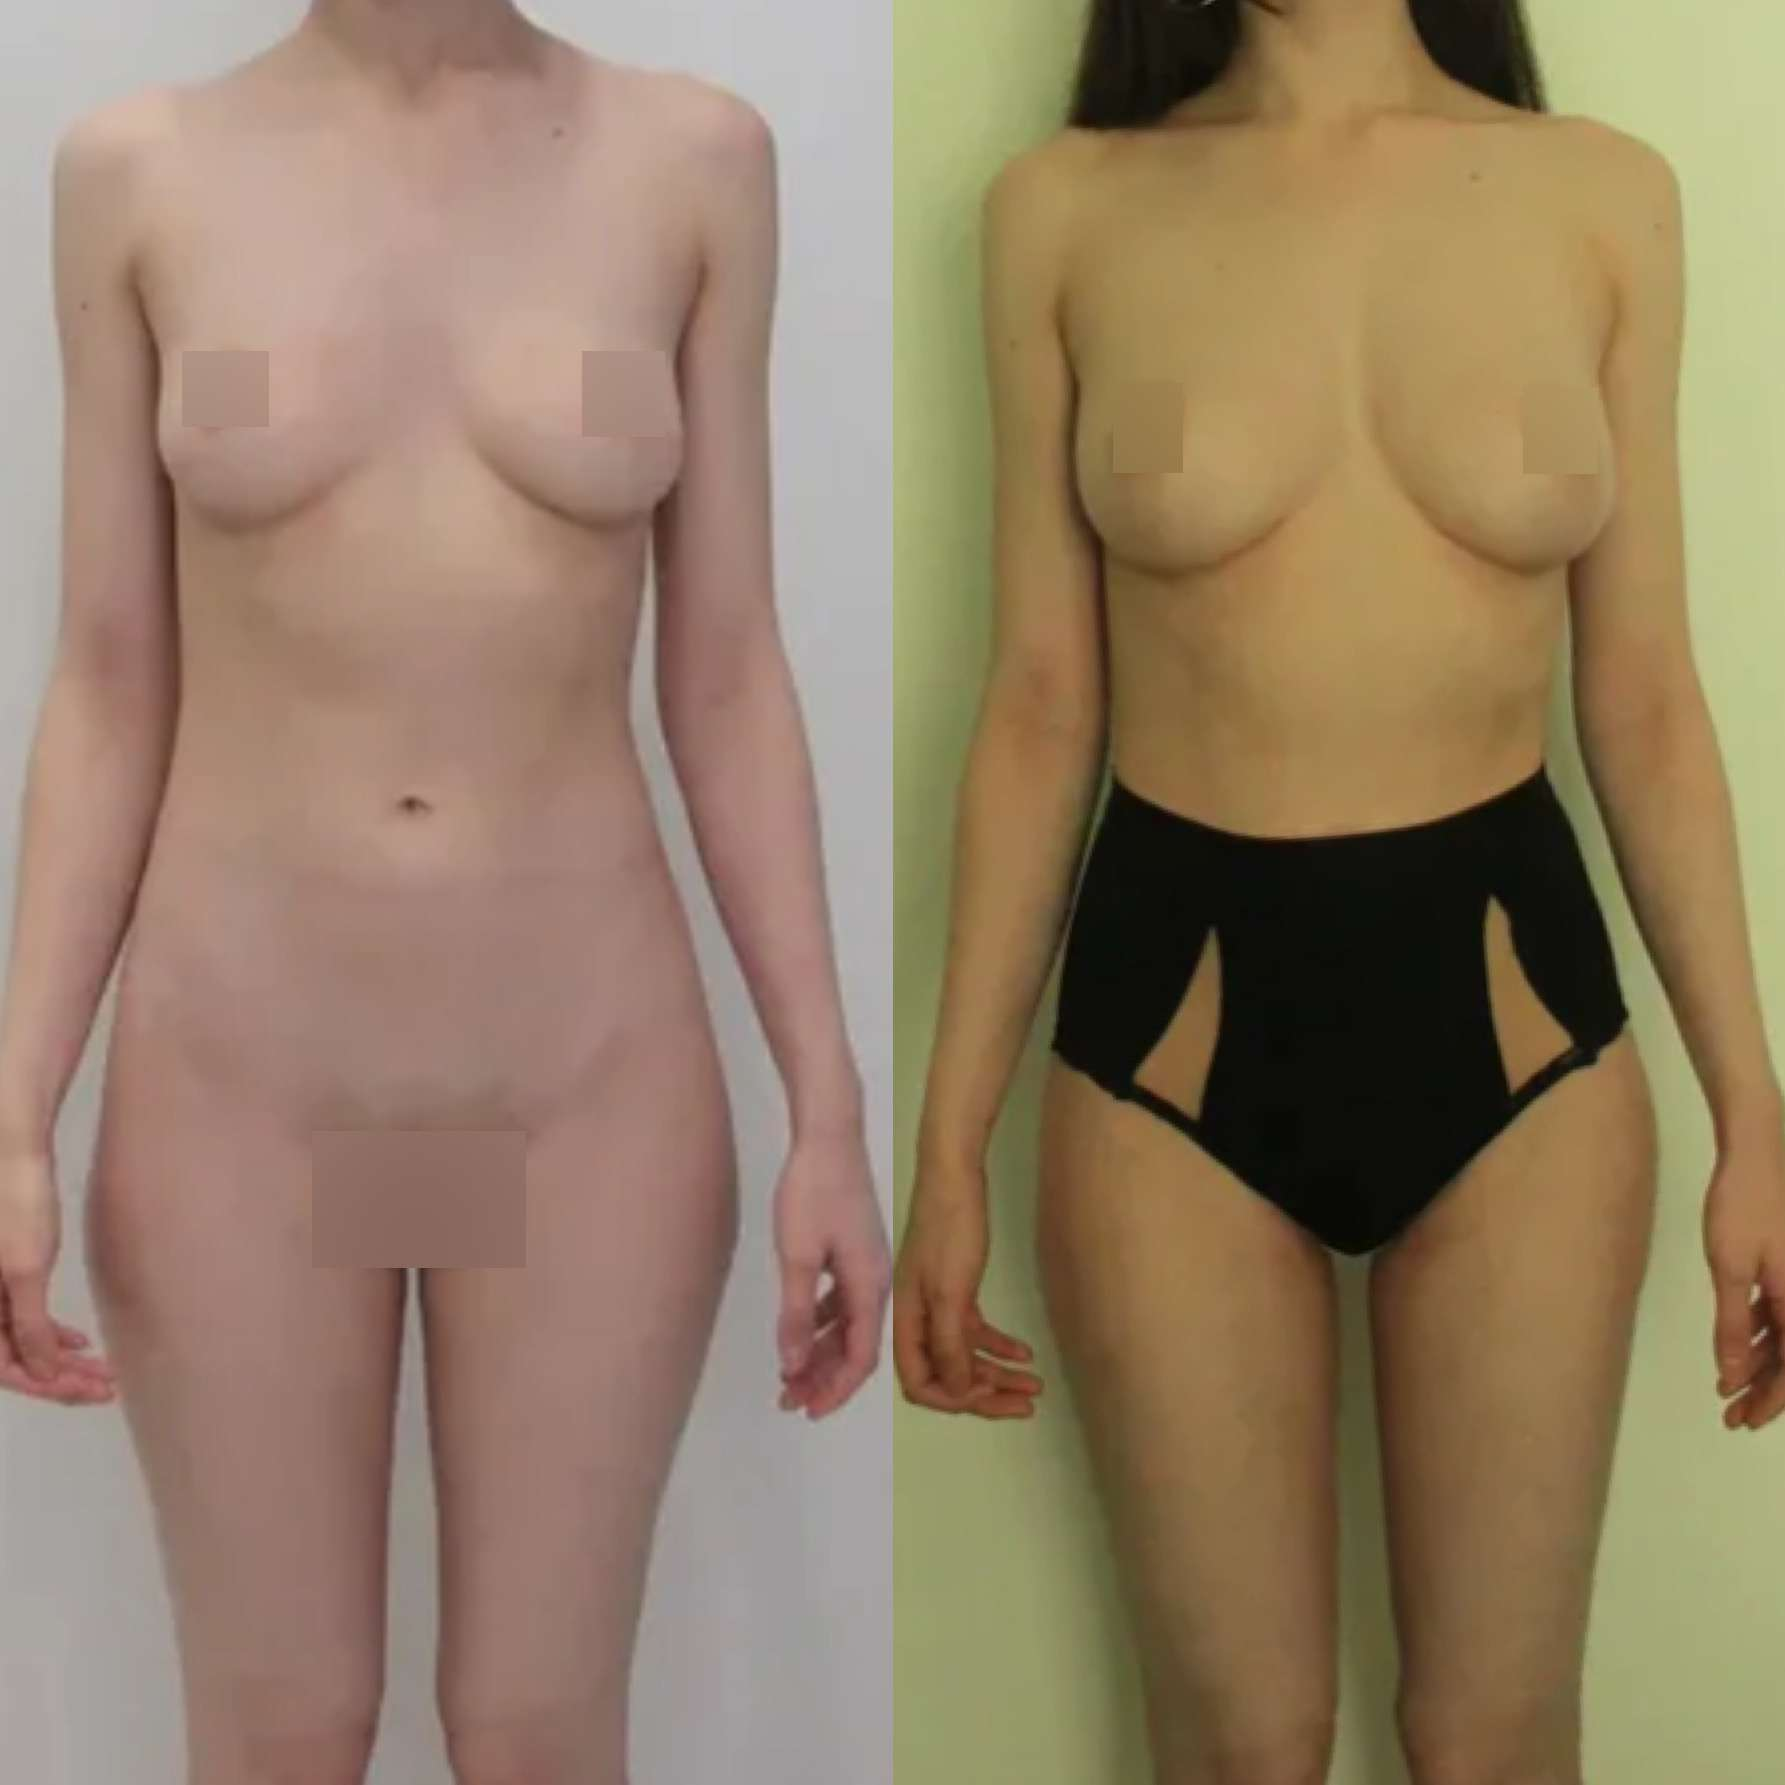 Липосакция галифе, липофилинг груди, спустя 1 месяц